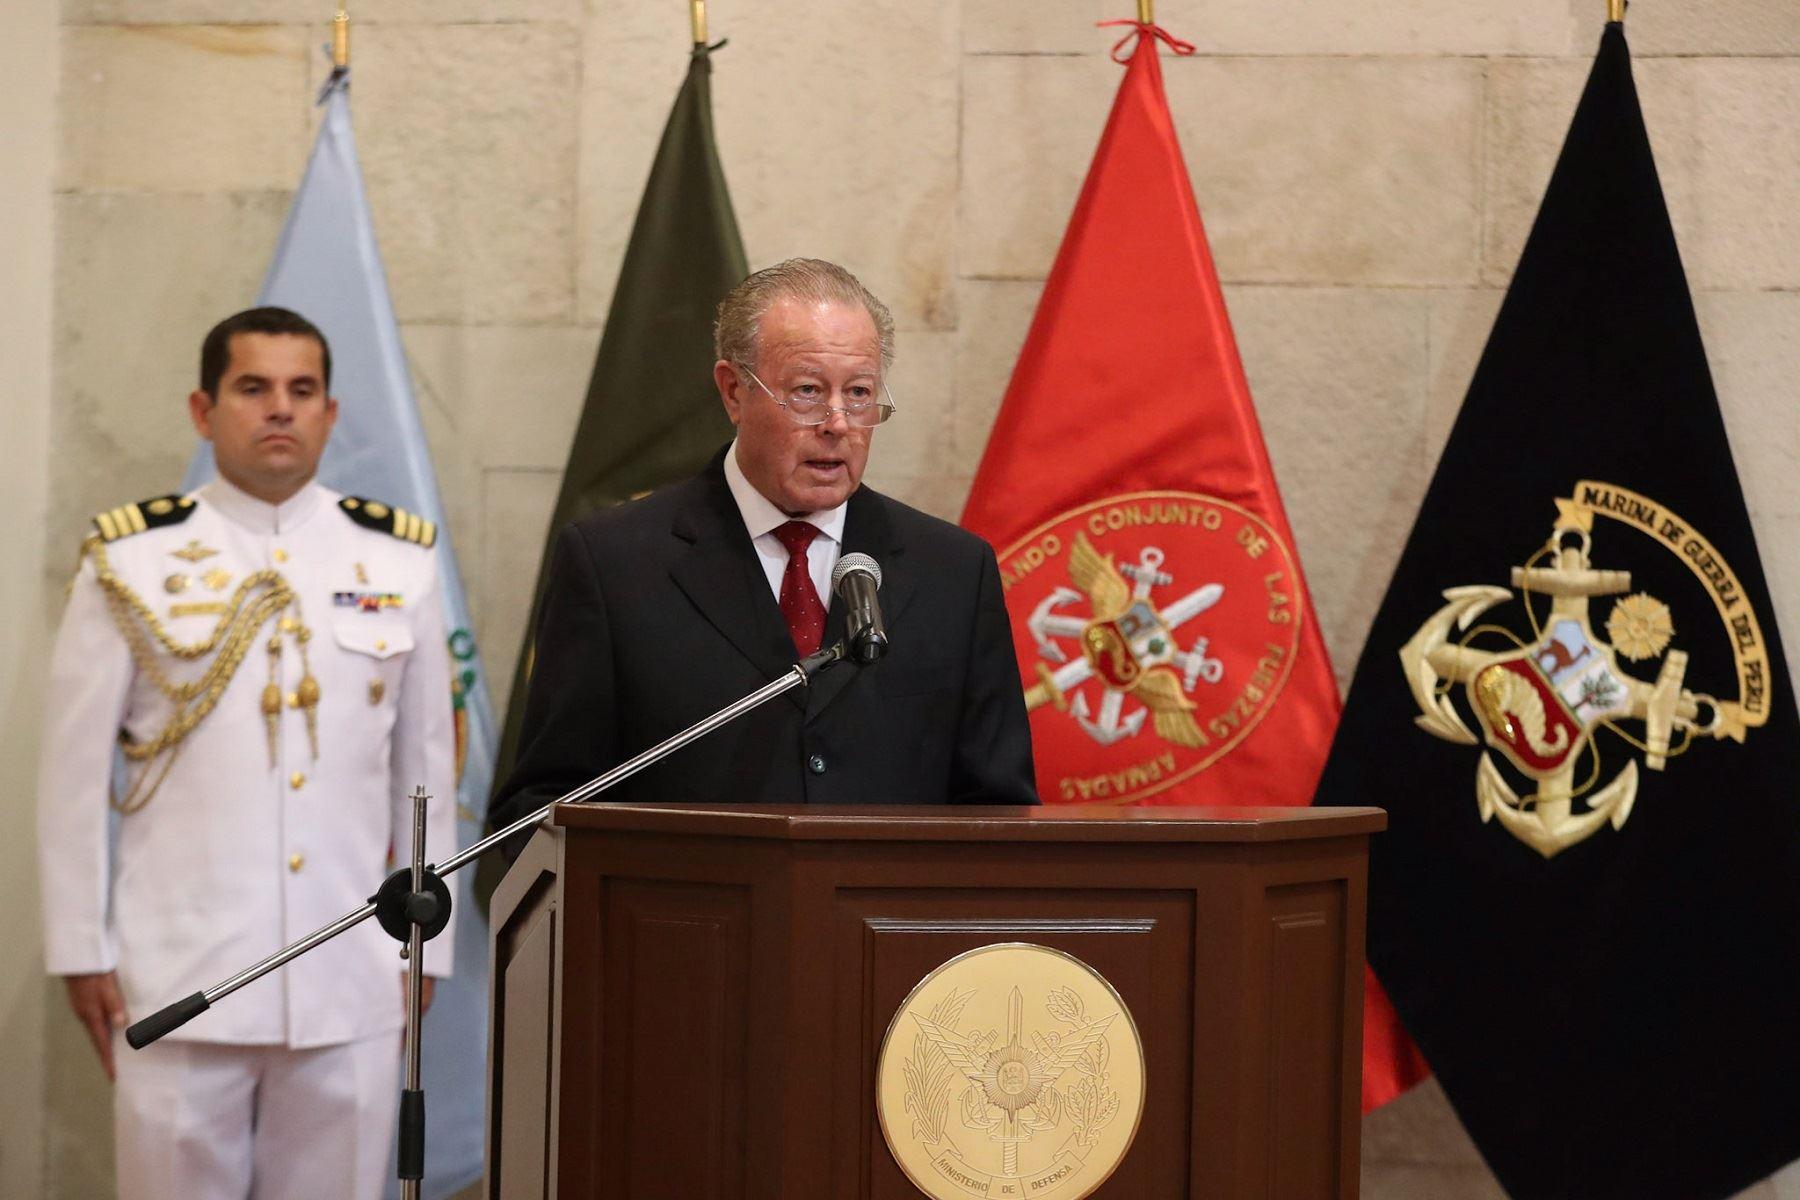 Ministro de Defensa, Jorge Kisic.